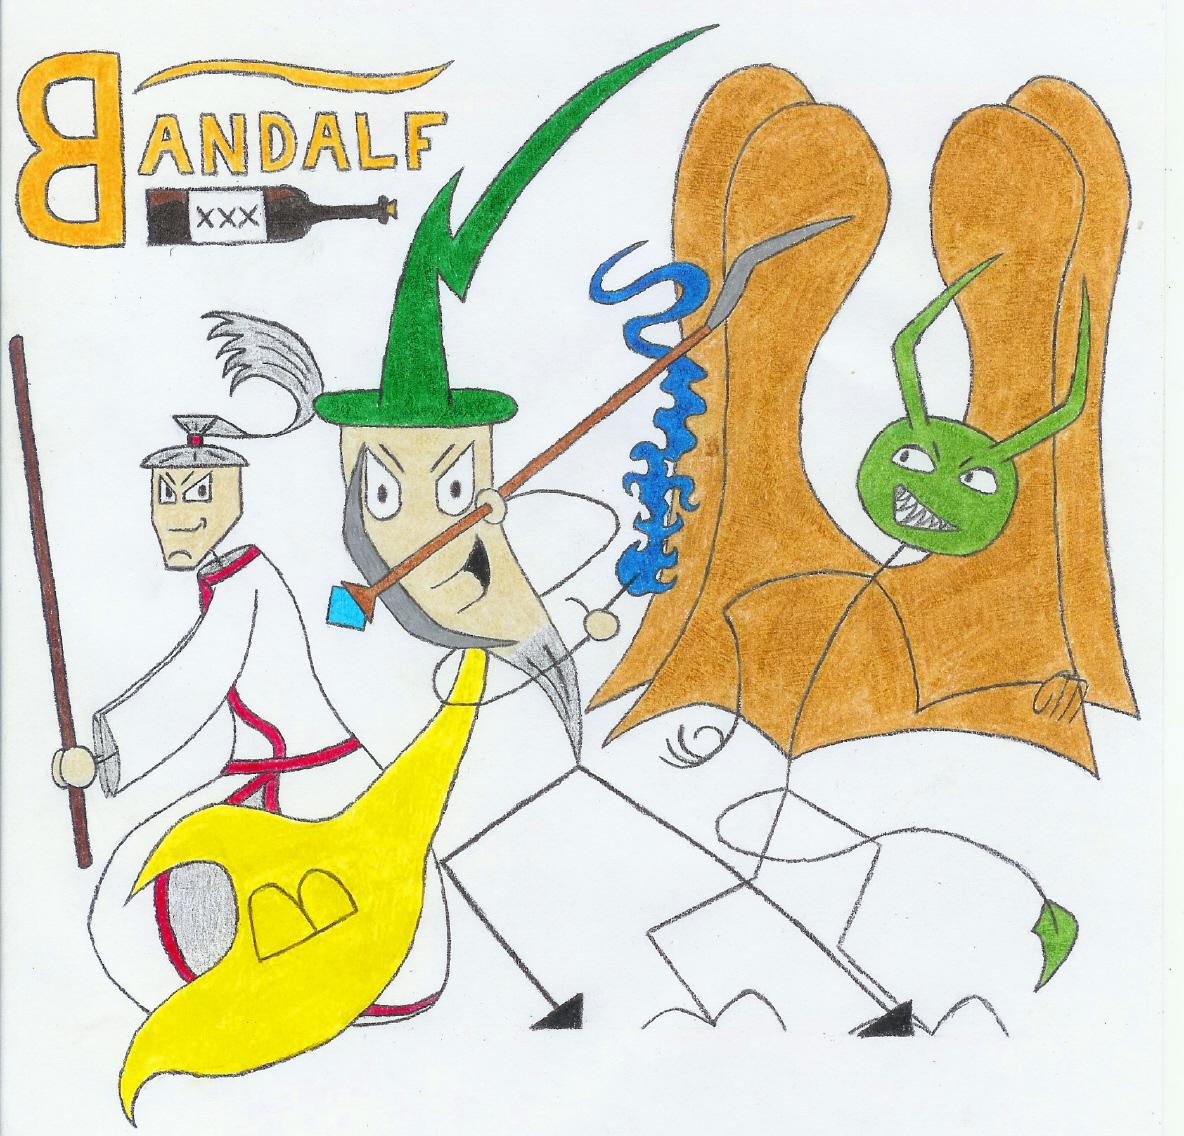 Bandalf Comic Art